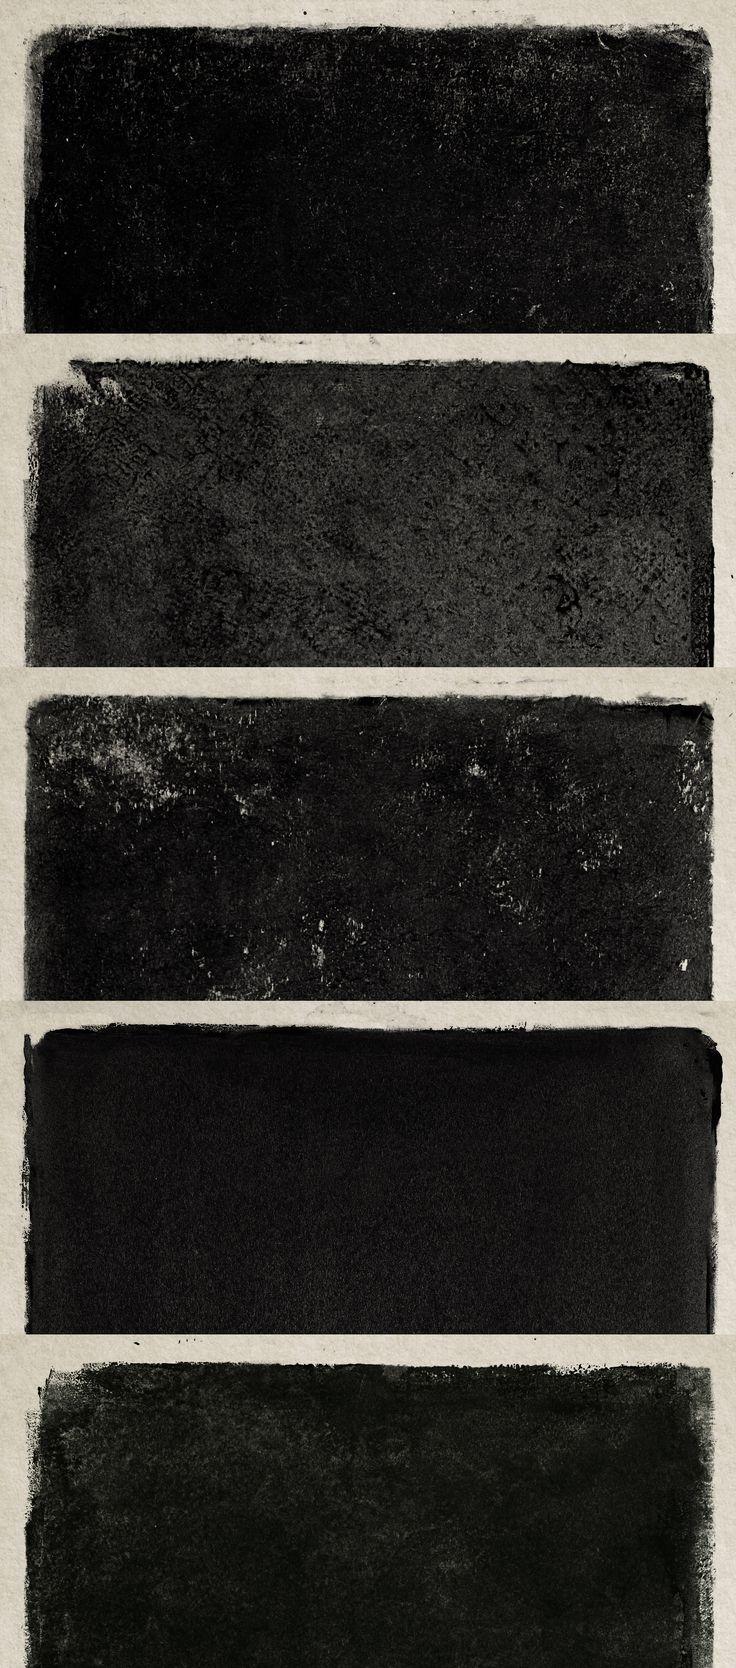 5 Soft Grunge Textures | GraphicBurger http://graphicburger.com/5-soft-grunge-textures/